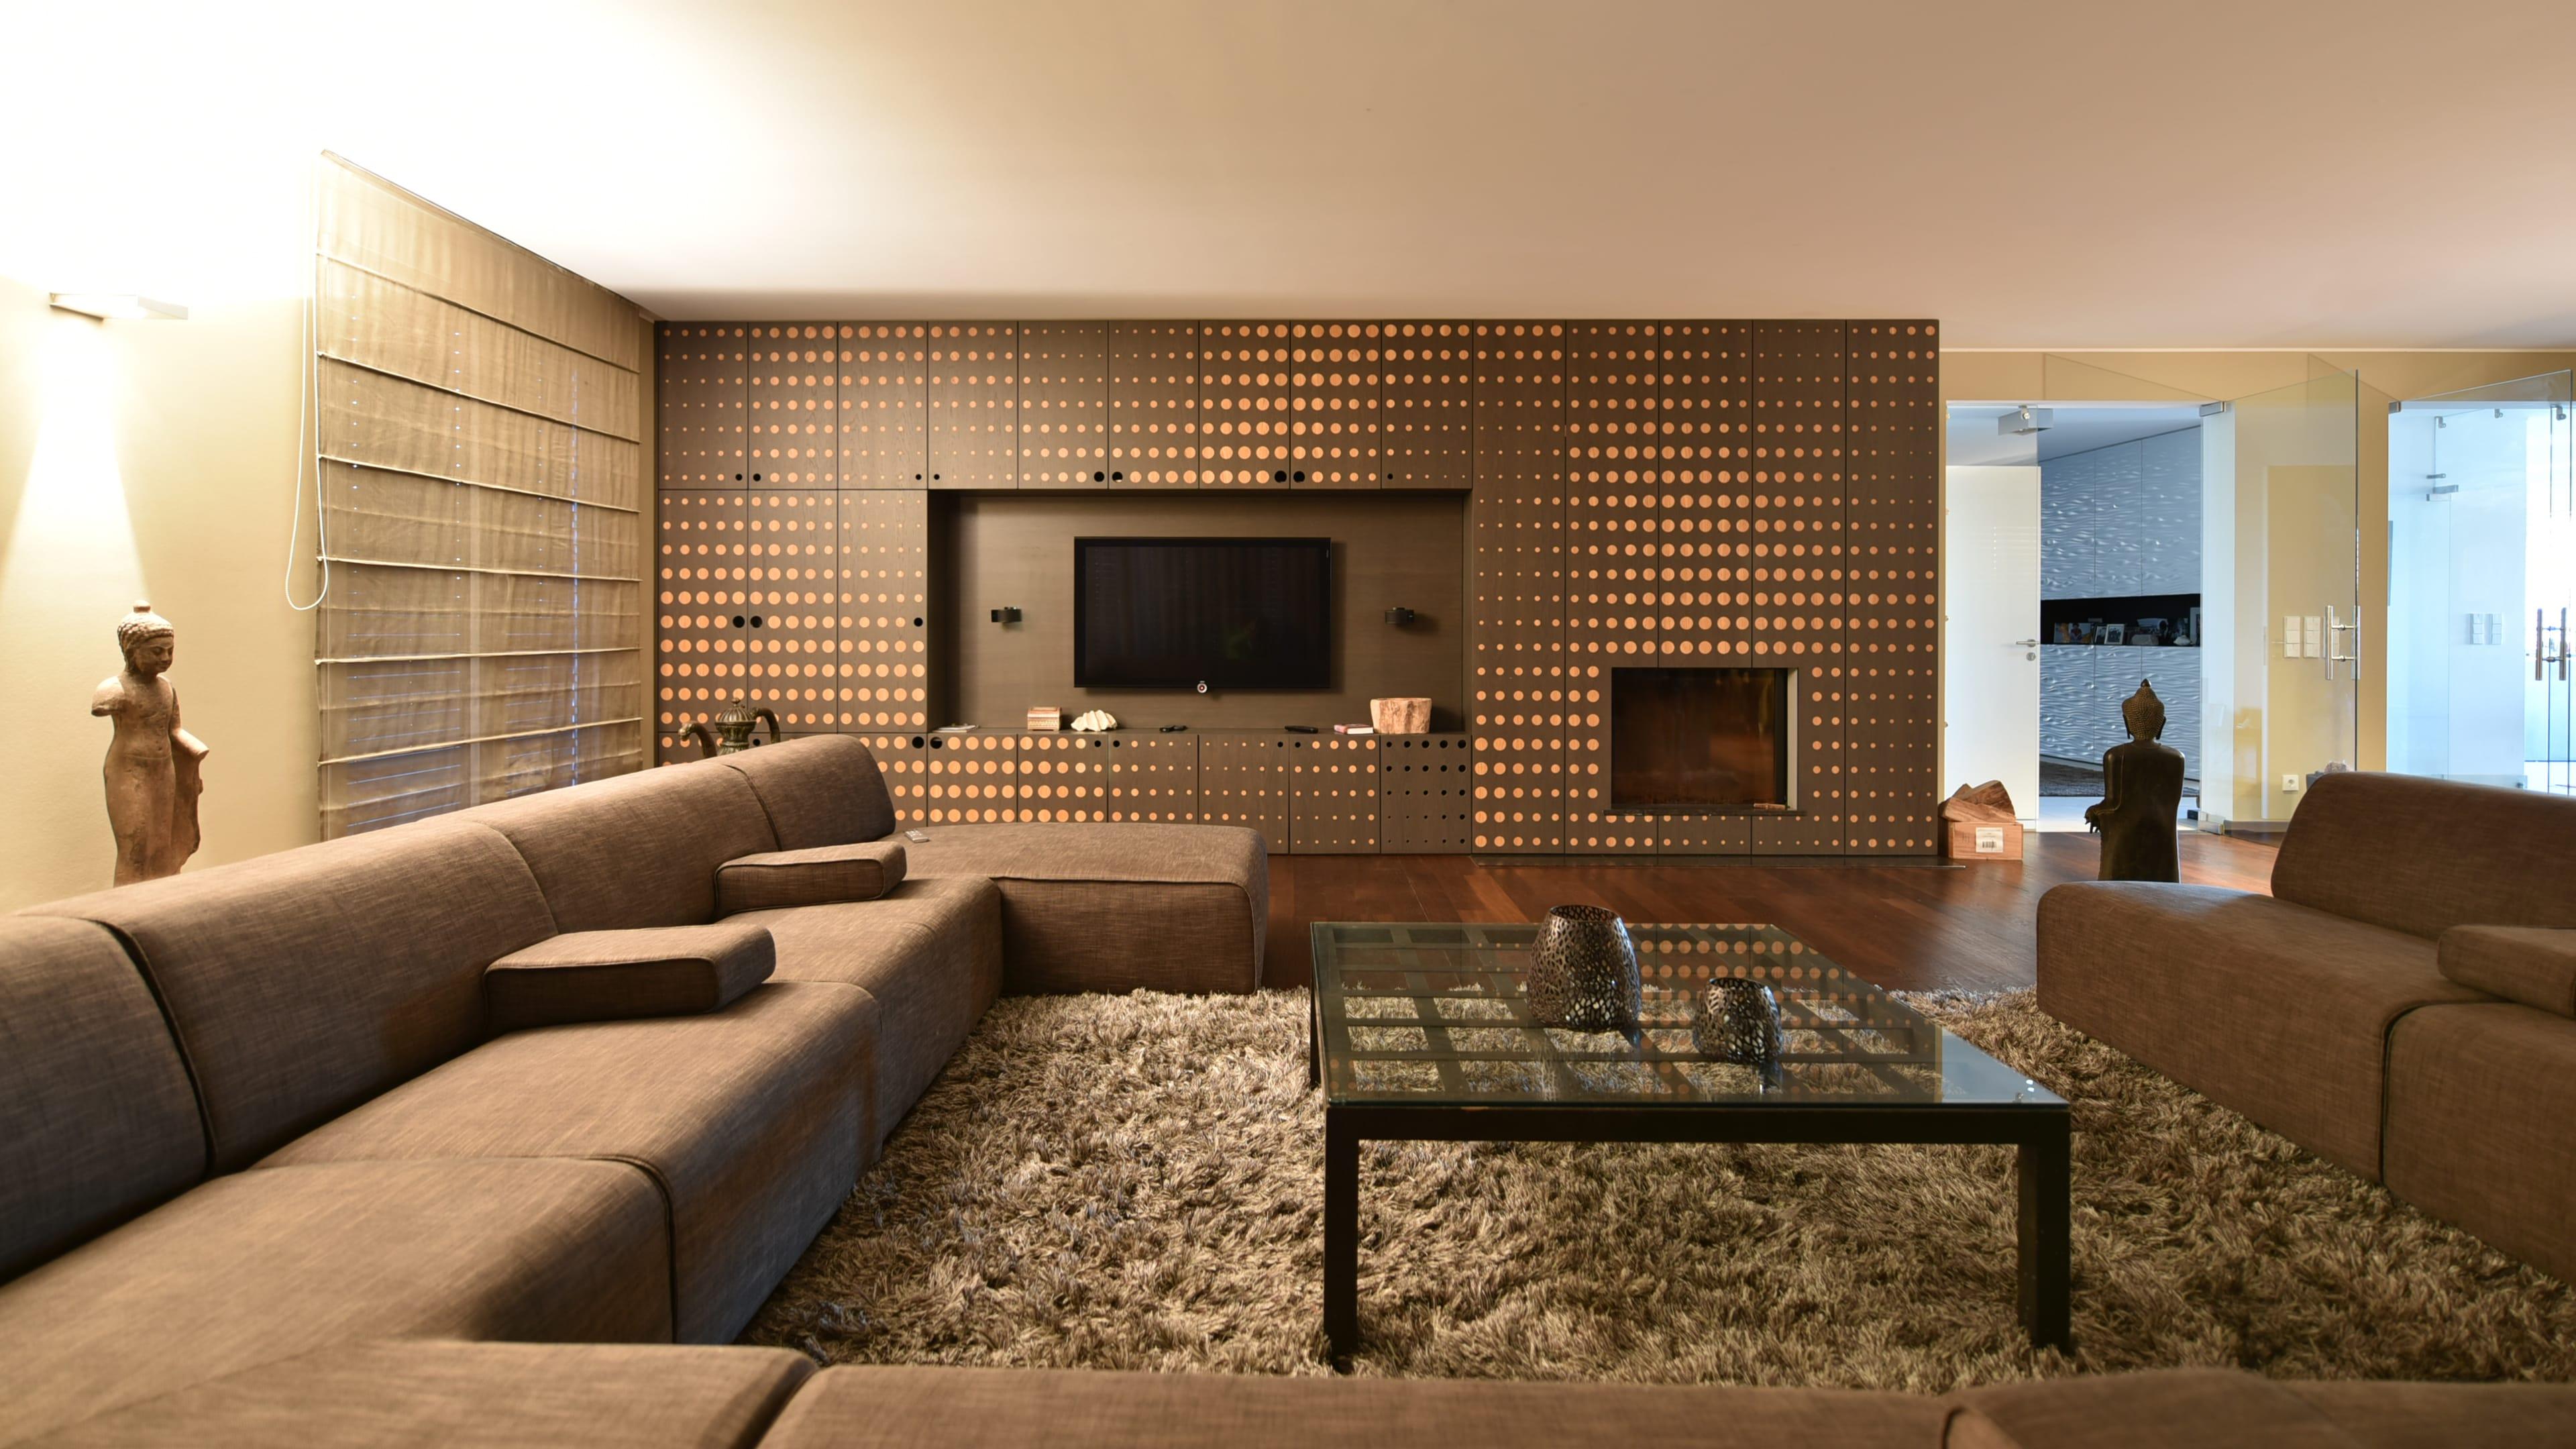 Interieur De Luxe Appartement 001-luxembourg-penthouse-appartement-interieur-luxe-bois